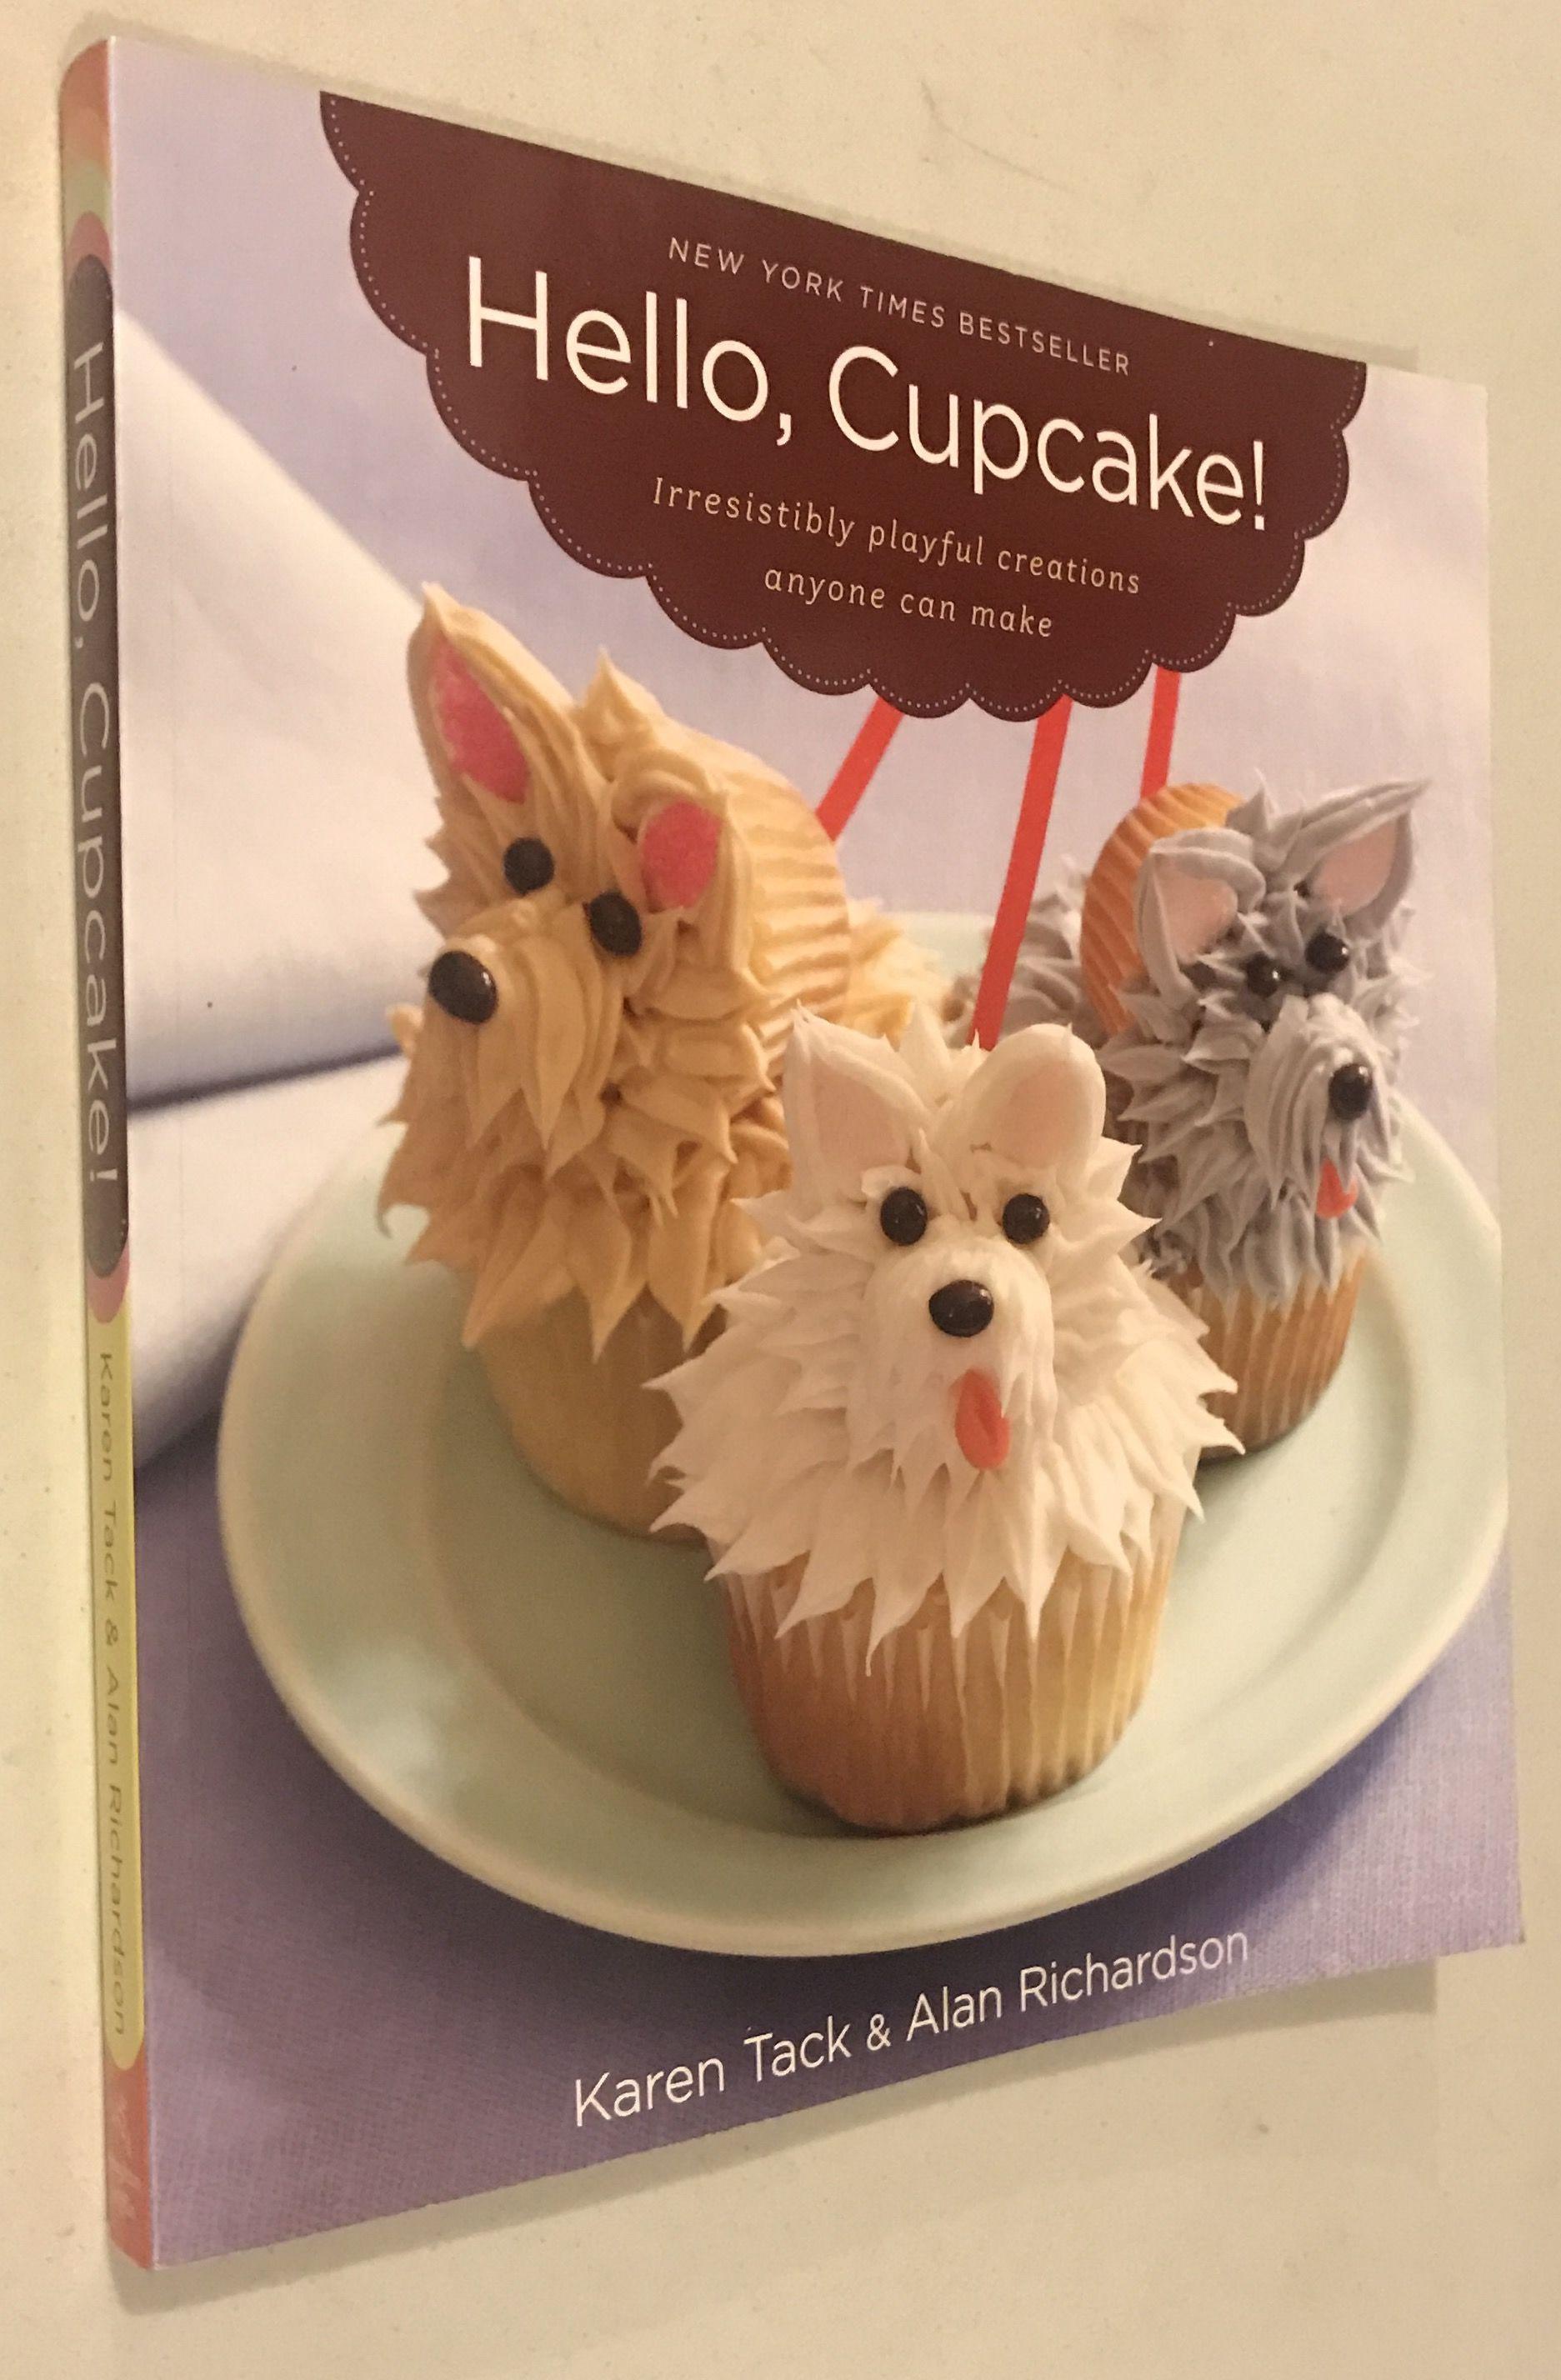 9780618829255 - Hello, Cupcake! Irresistibly Playful Creations Anyone Can  Make by Karen Tack; Alan (Chef) Richardson